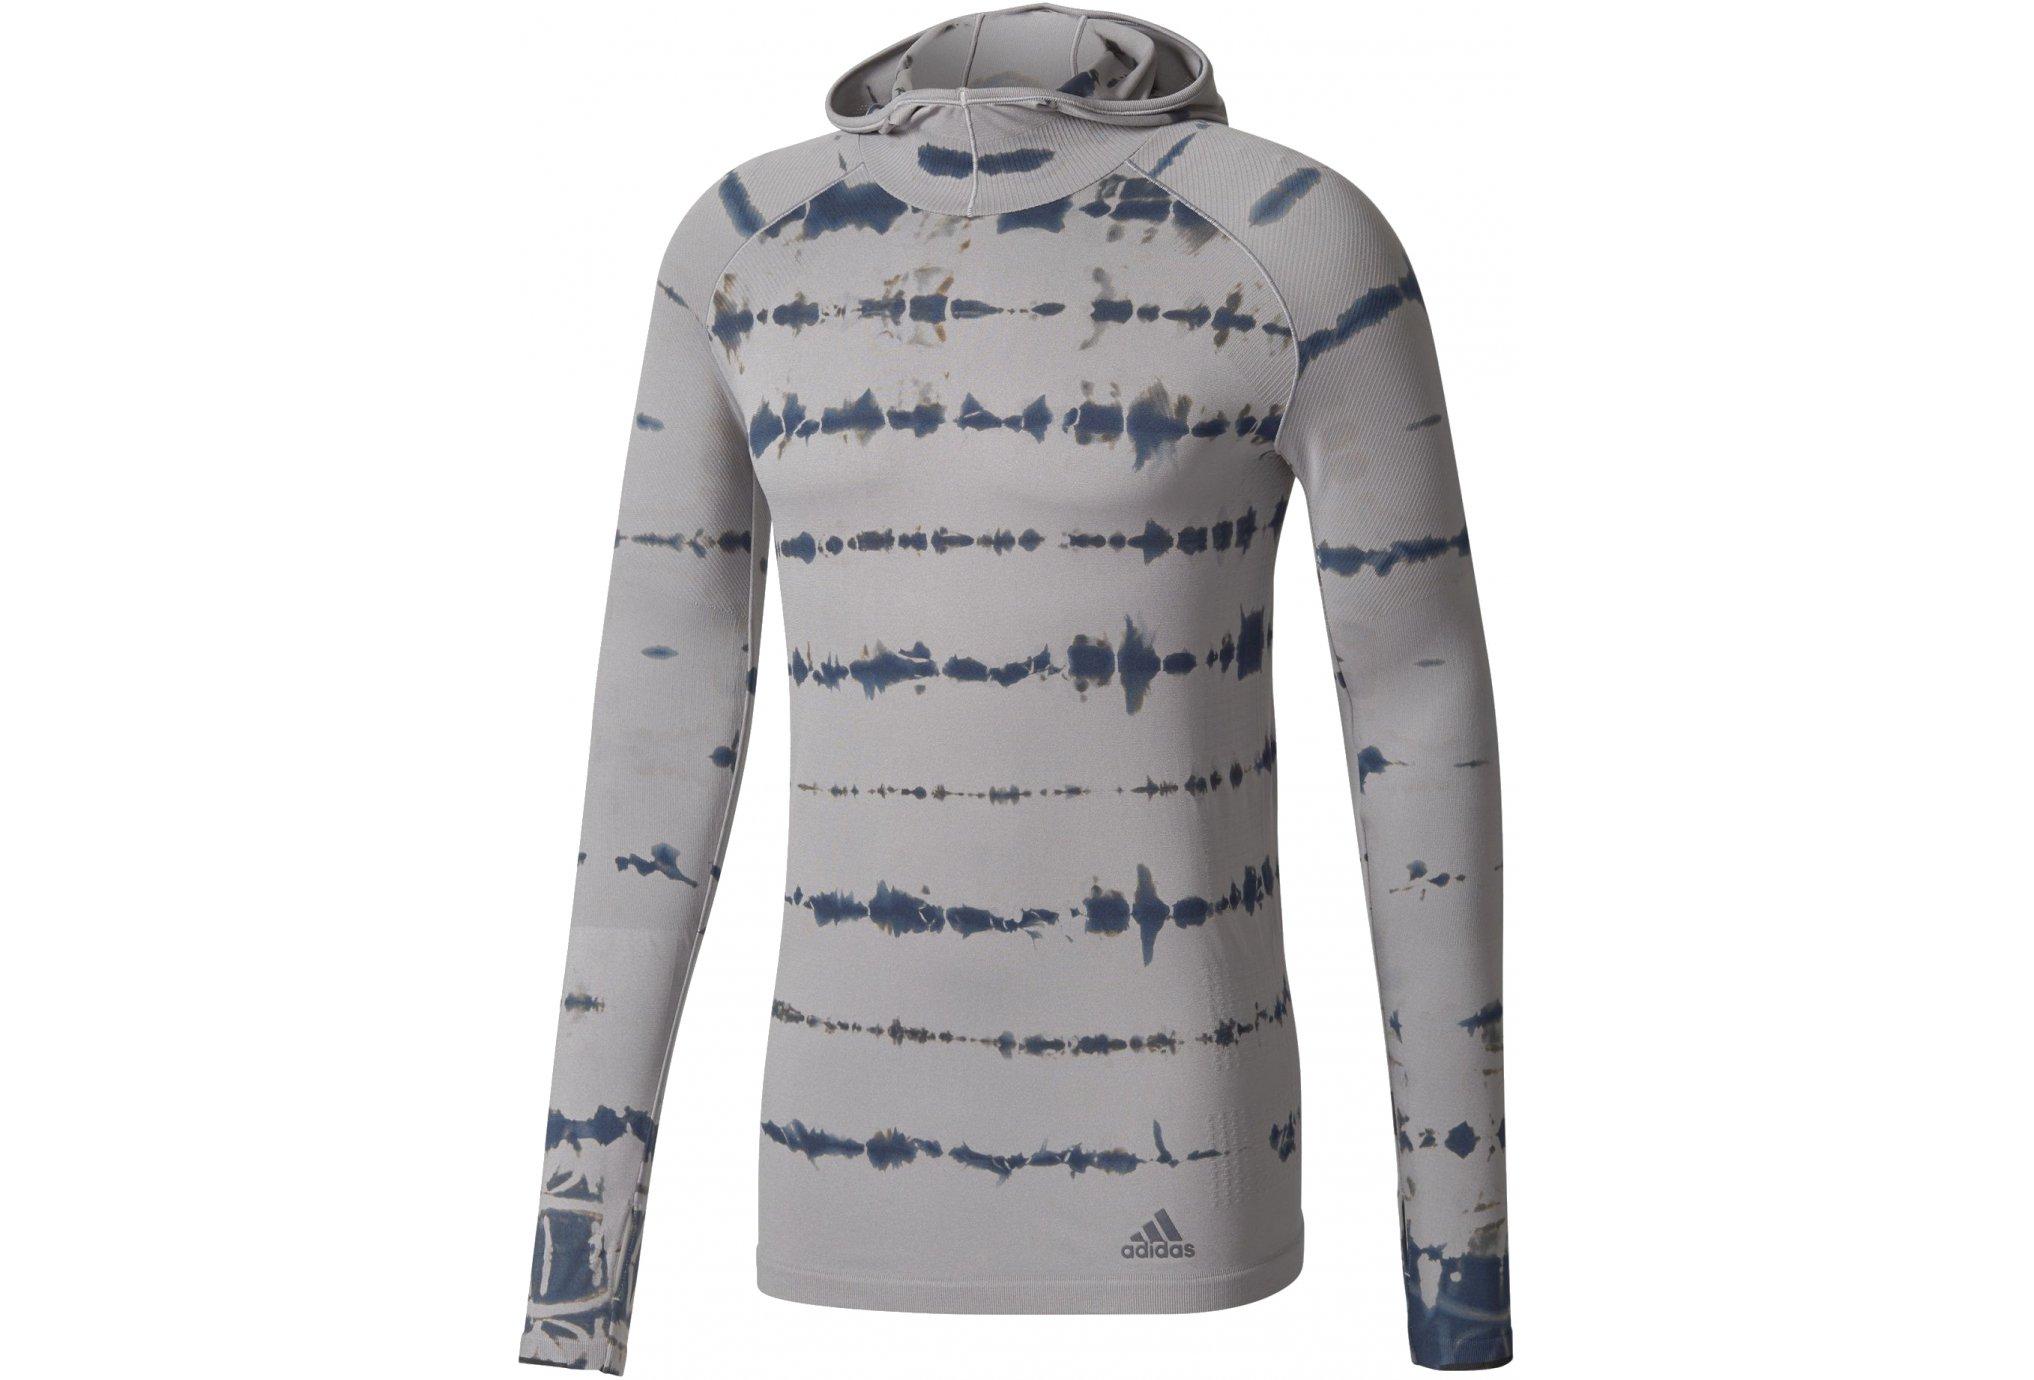 Adidas Primeknit wool m vêtement running homme